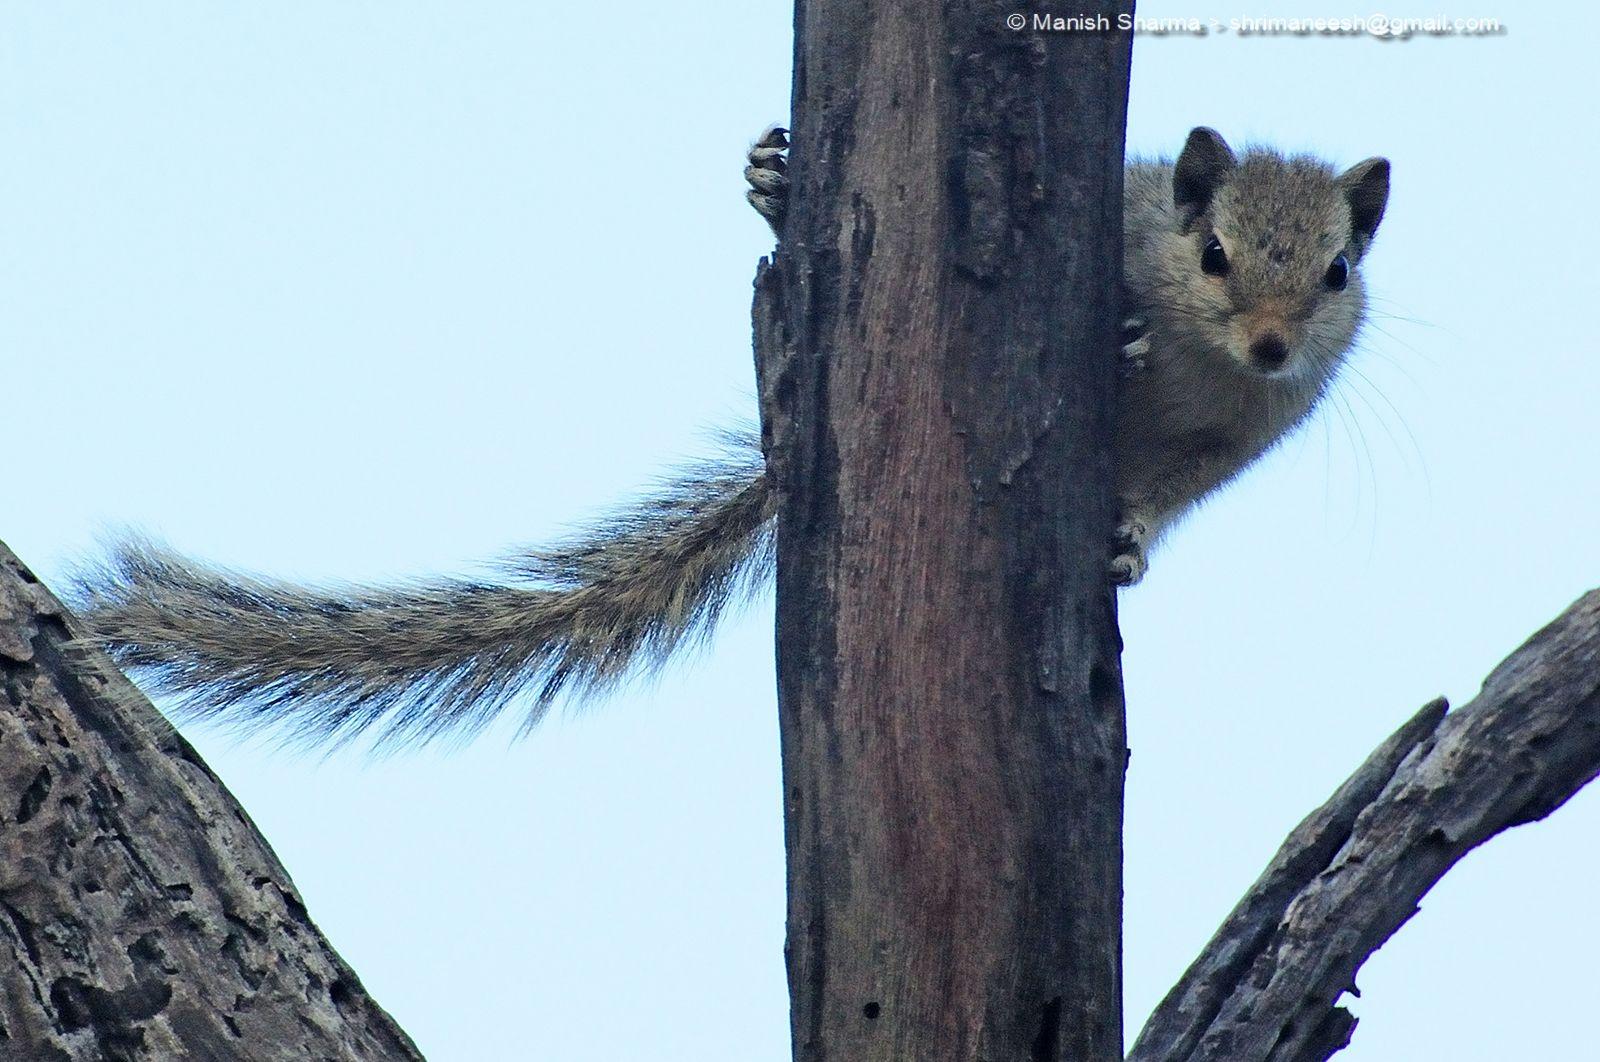 Indian Palm Squirrel...Scientific name: Funambulus palmarum  by Maneesh Sharma